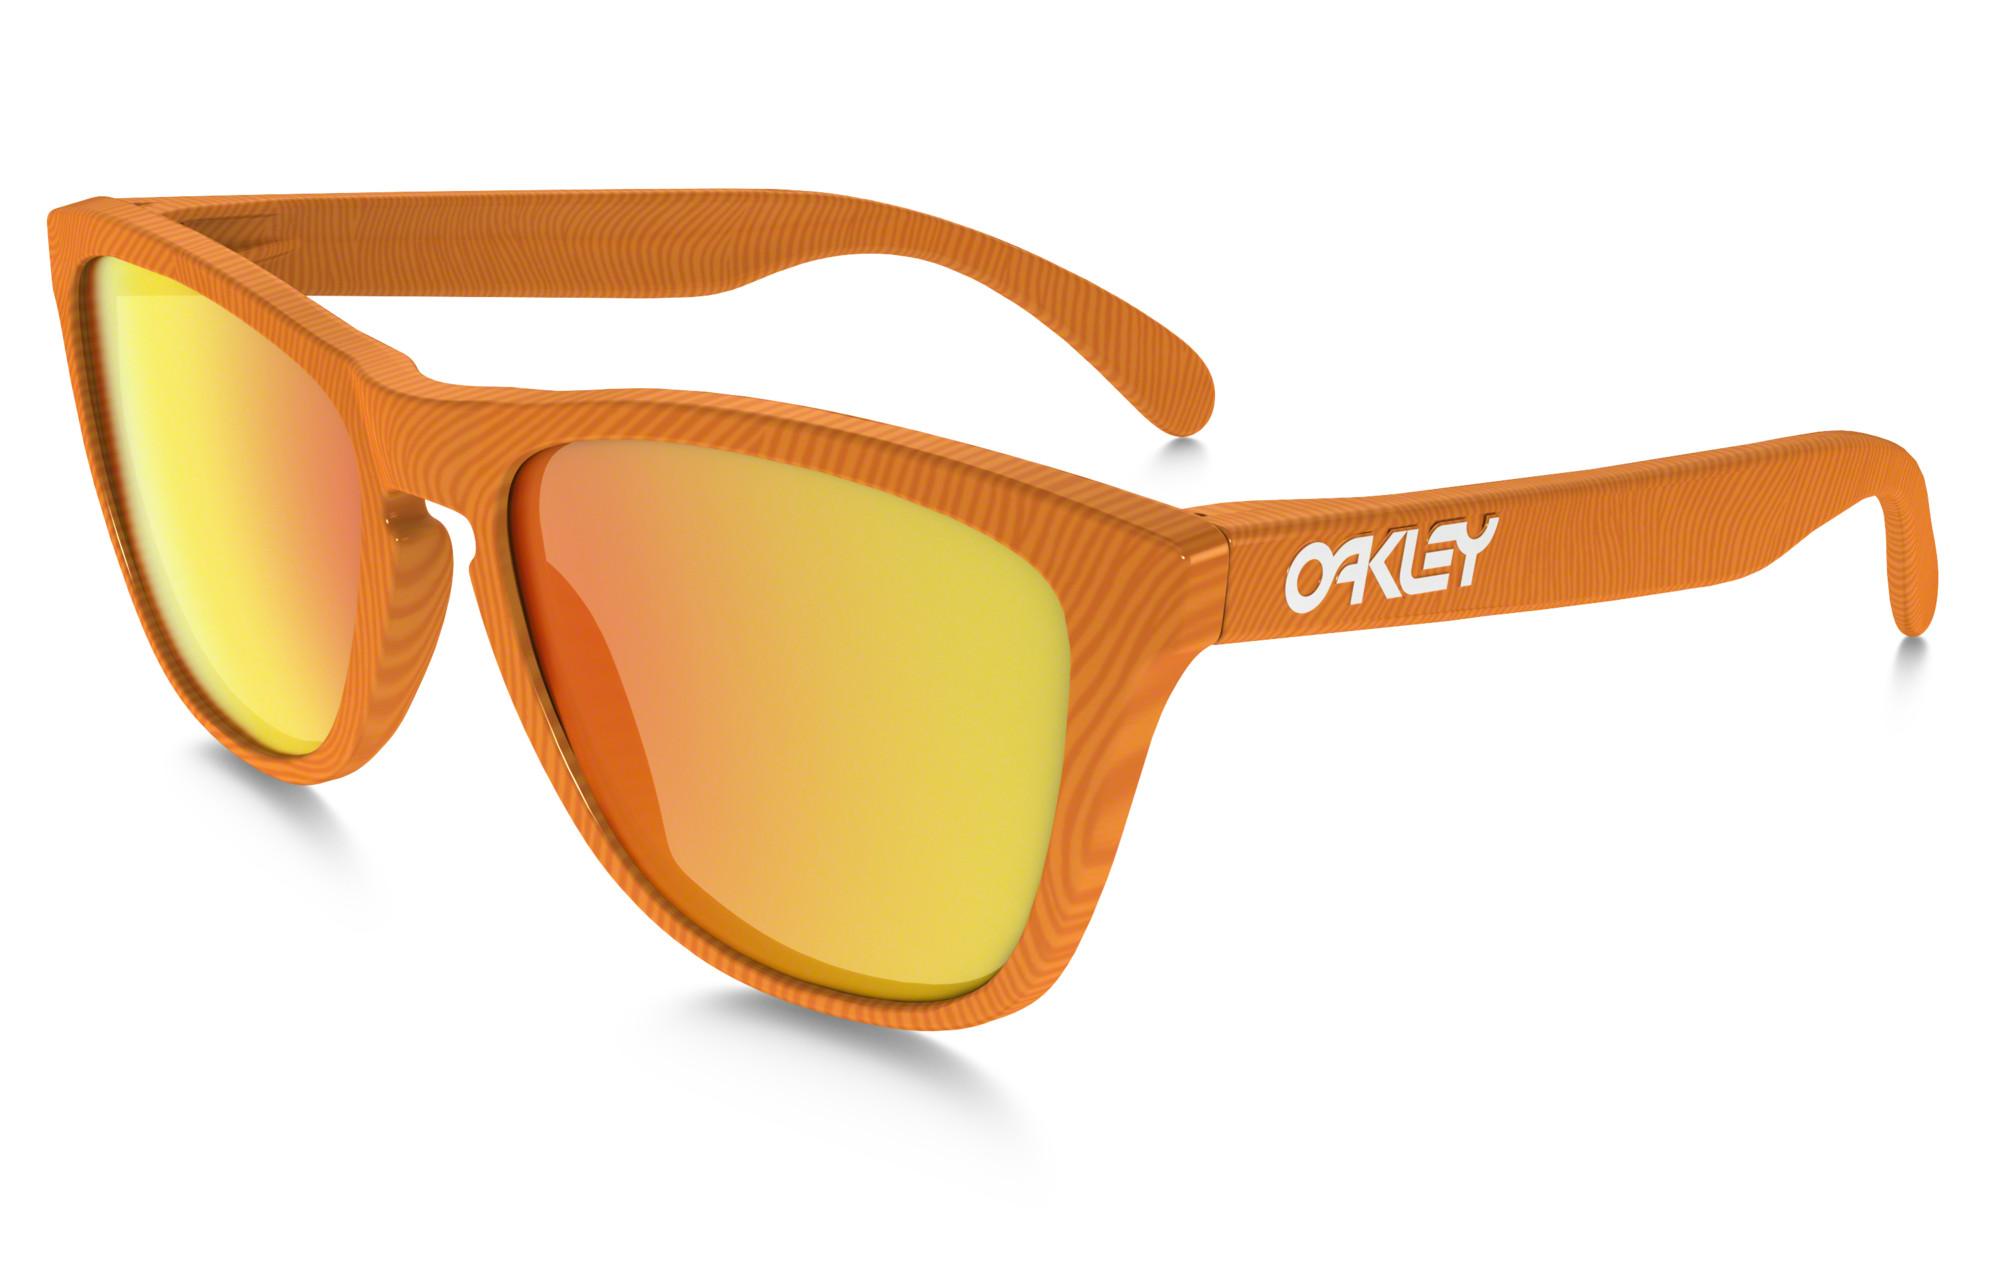 occhiali oakley arancioni